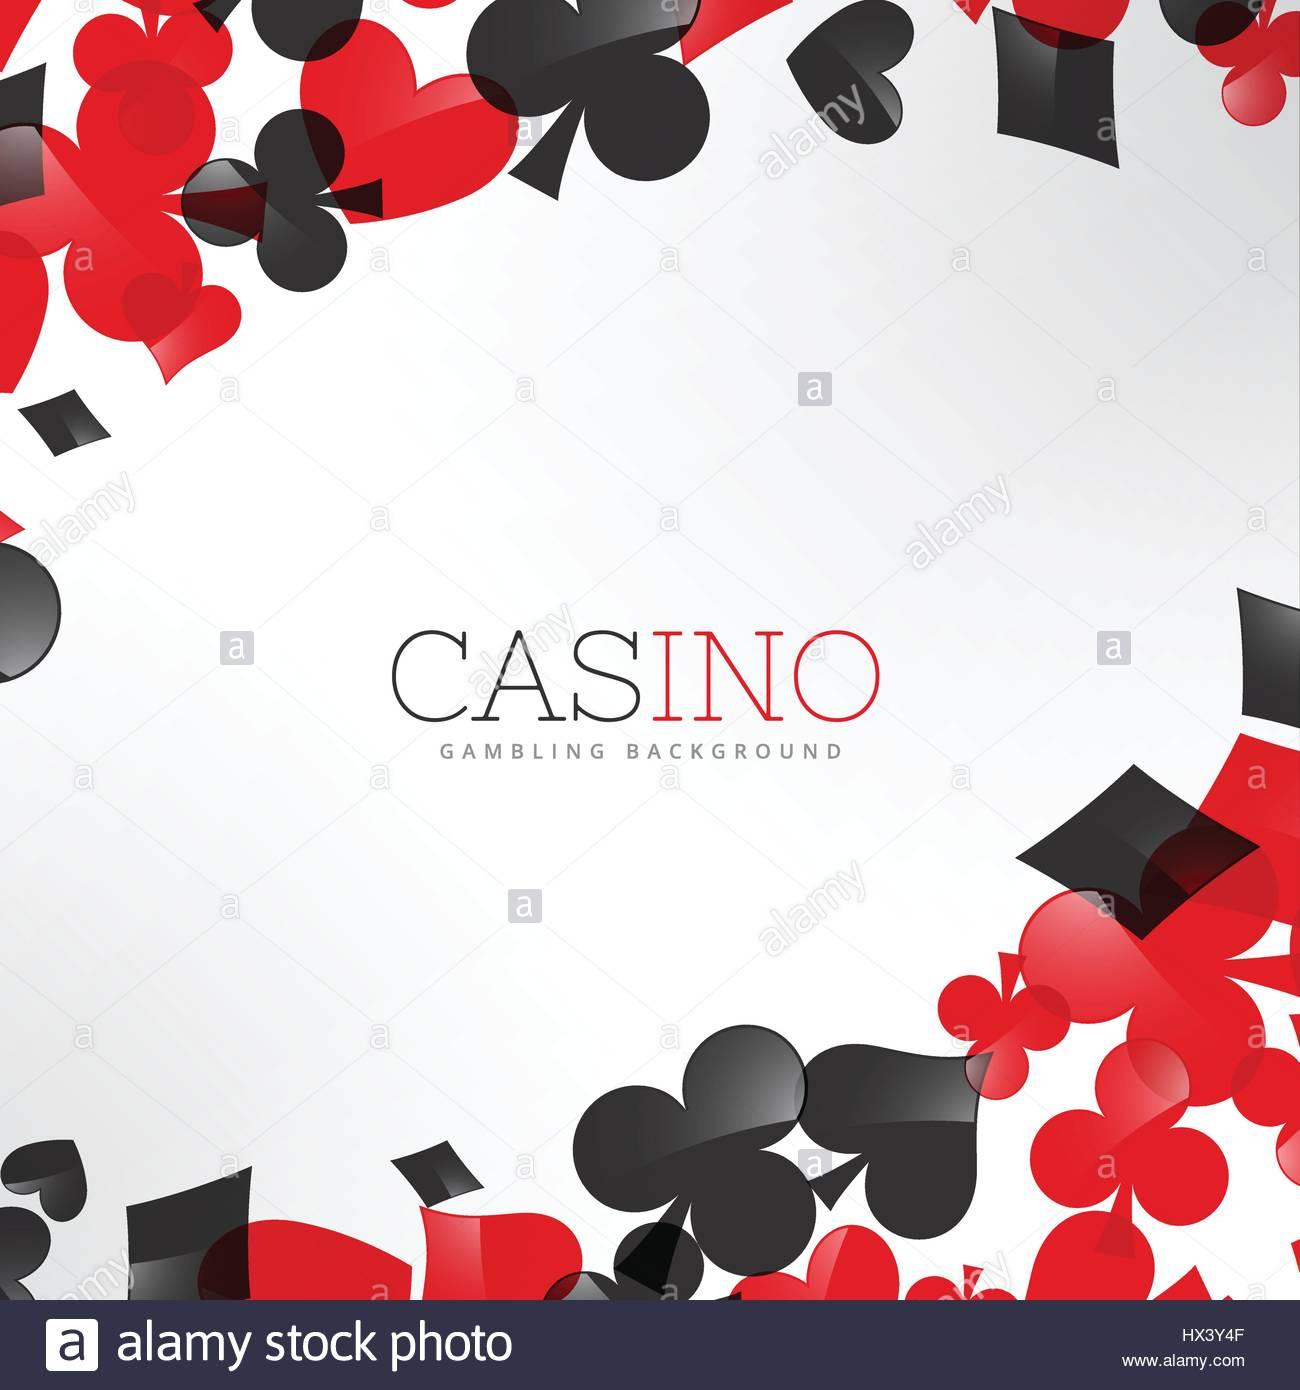 Casino background with playing cards symbols stock vector art casino background with playing cards symbols biocorpaavc